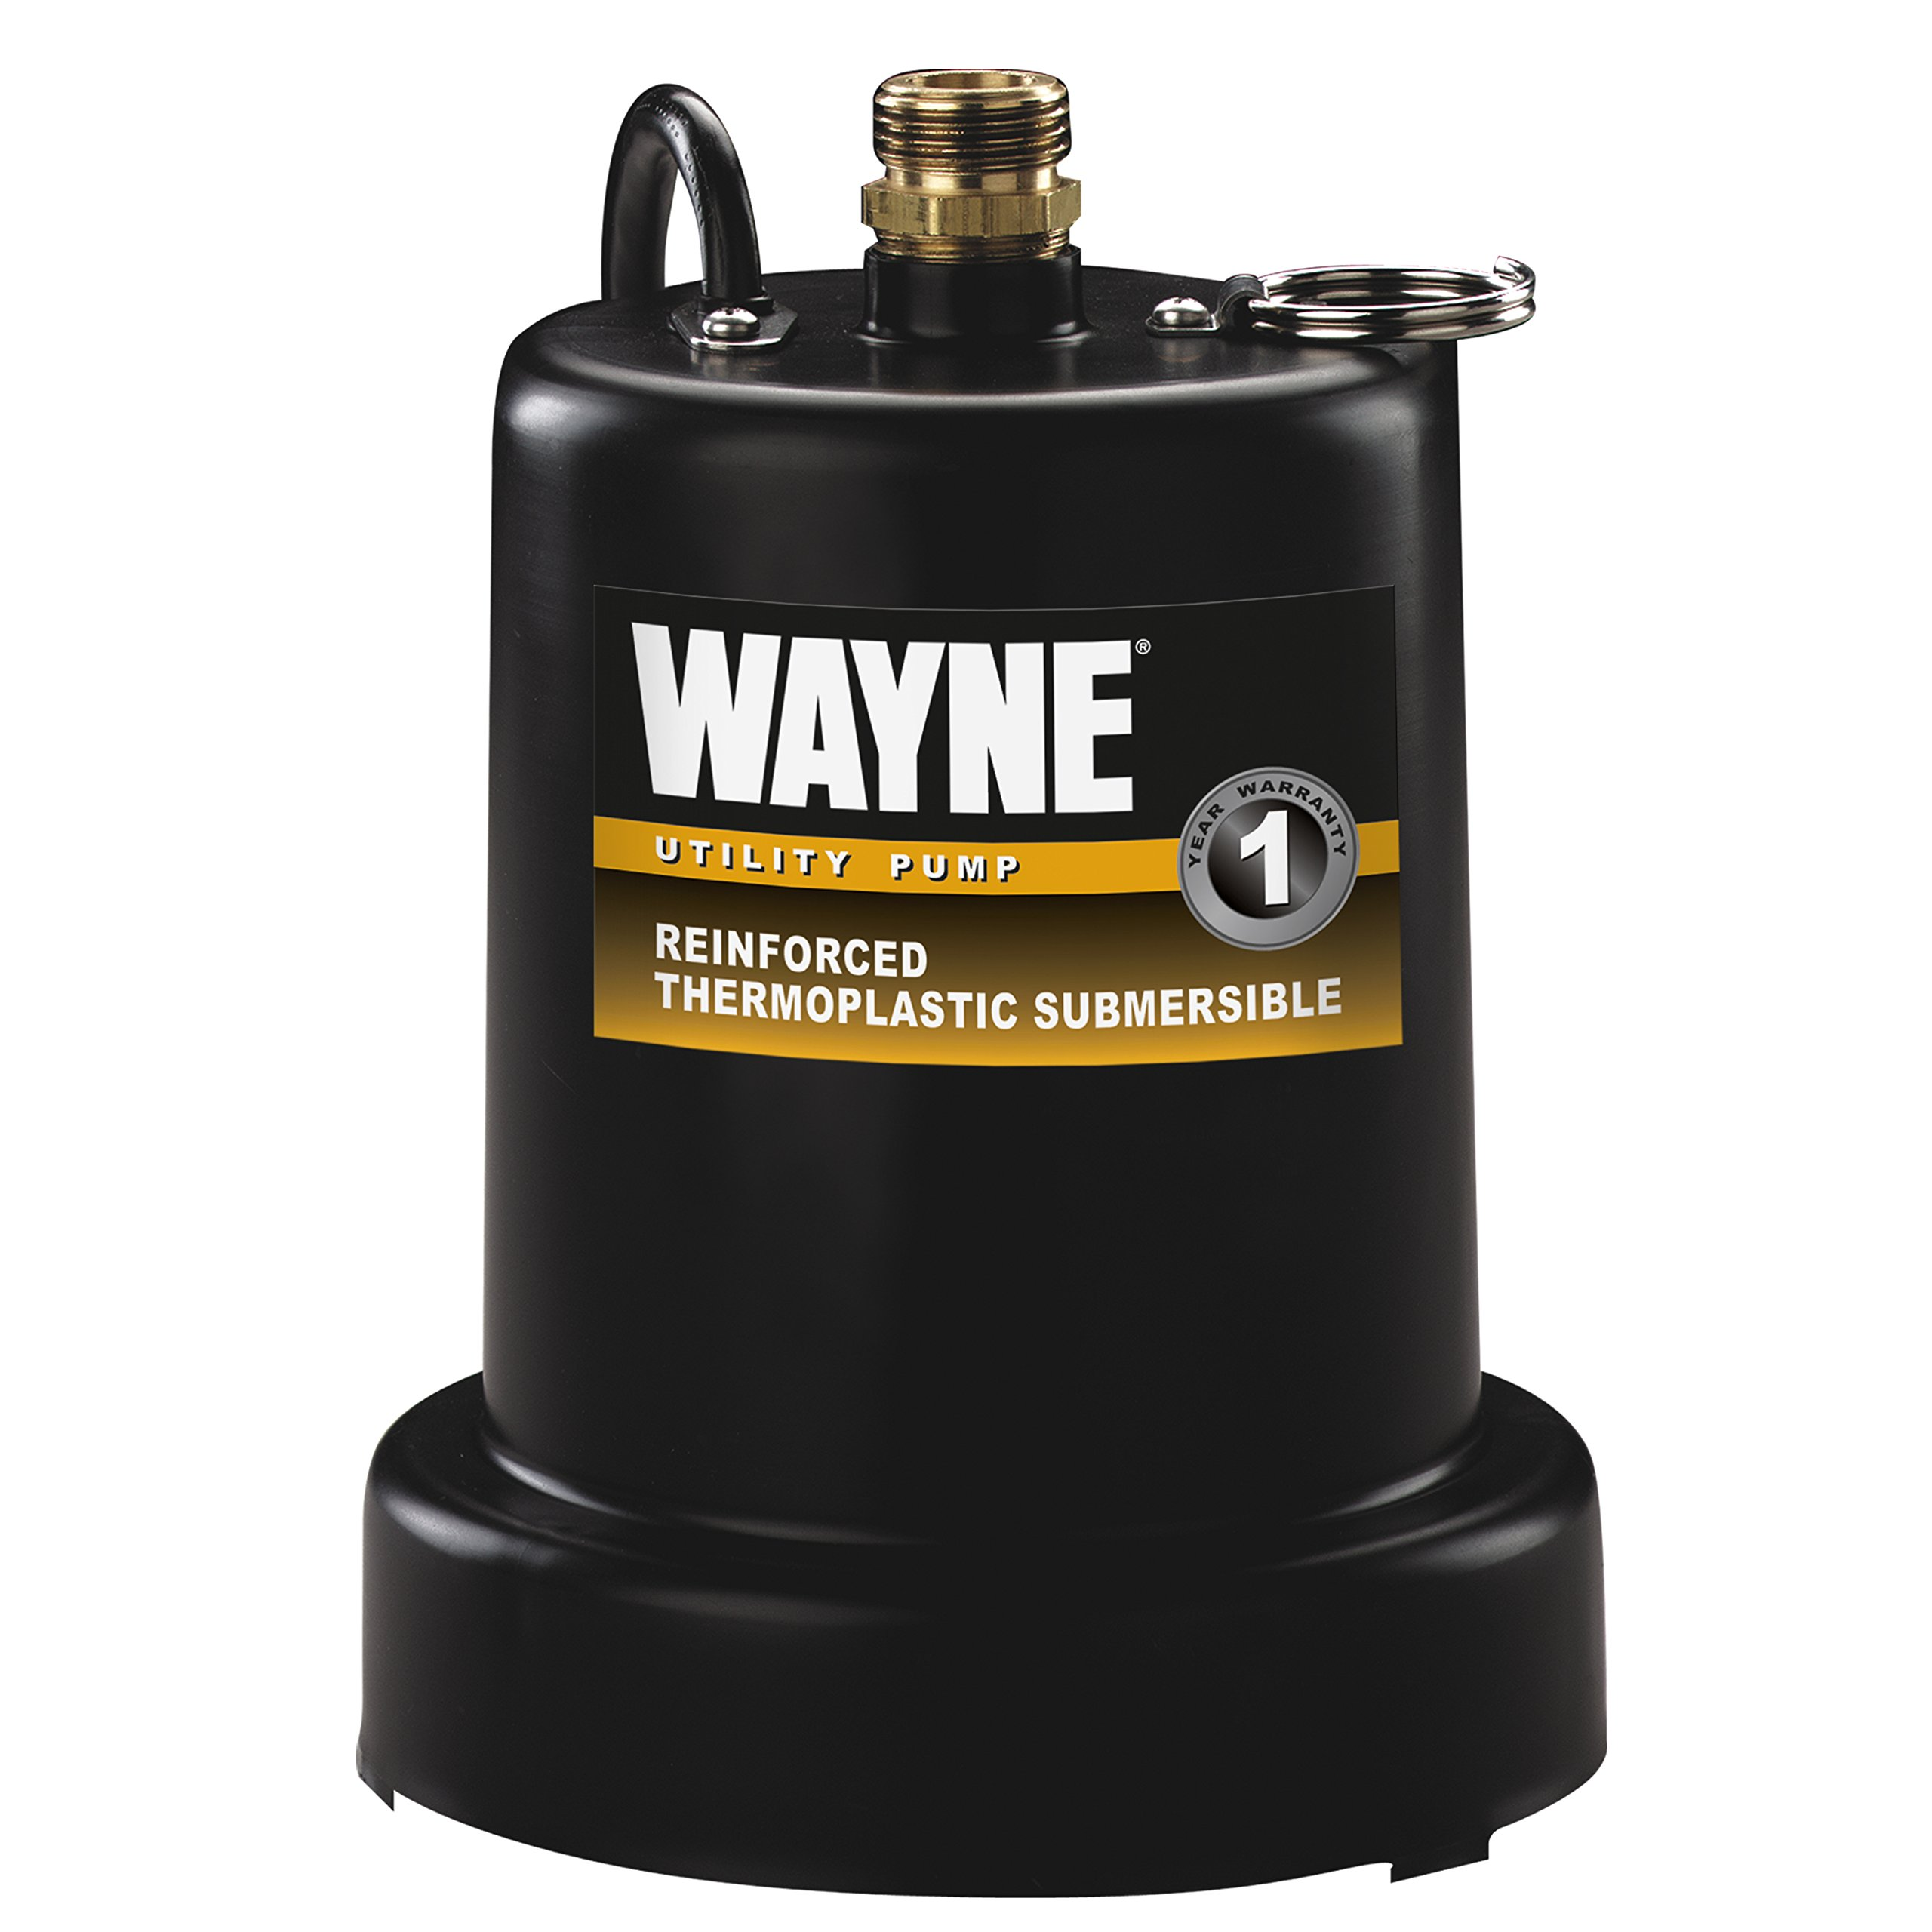 Wayne 56517 TSC130 Utility Pump by Wayne